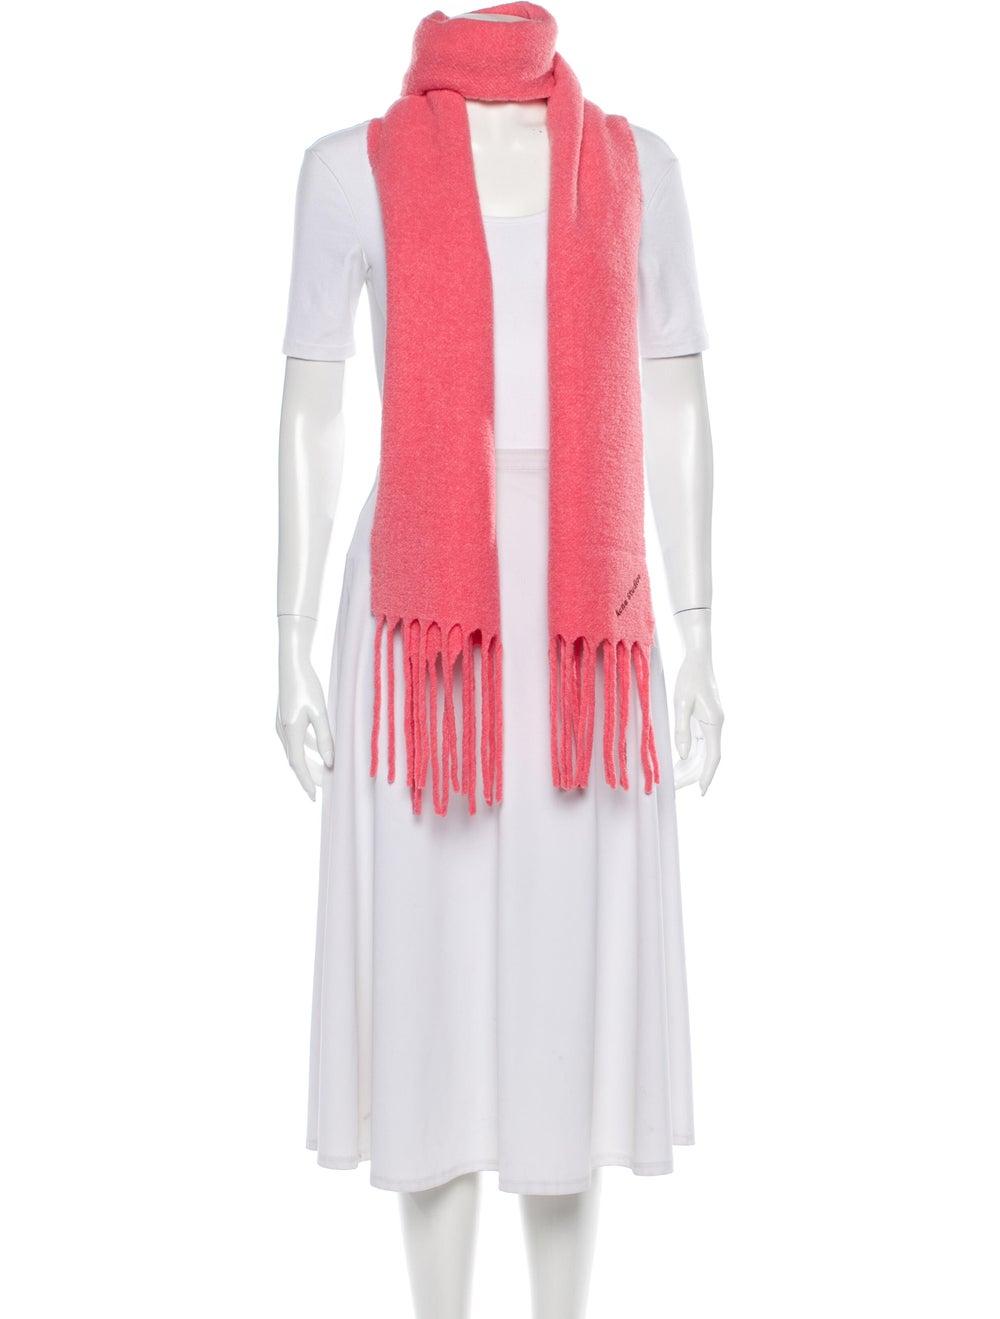 Acne Studios Villy Wool Scarf Pink - image 3